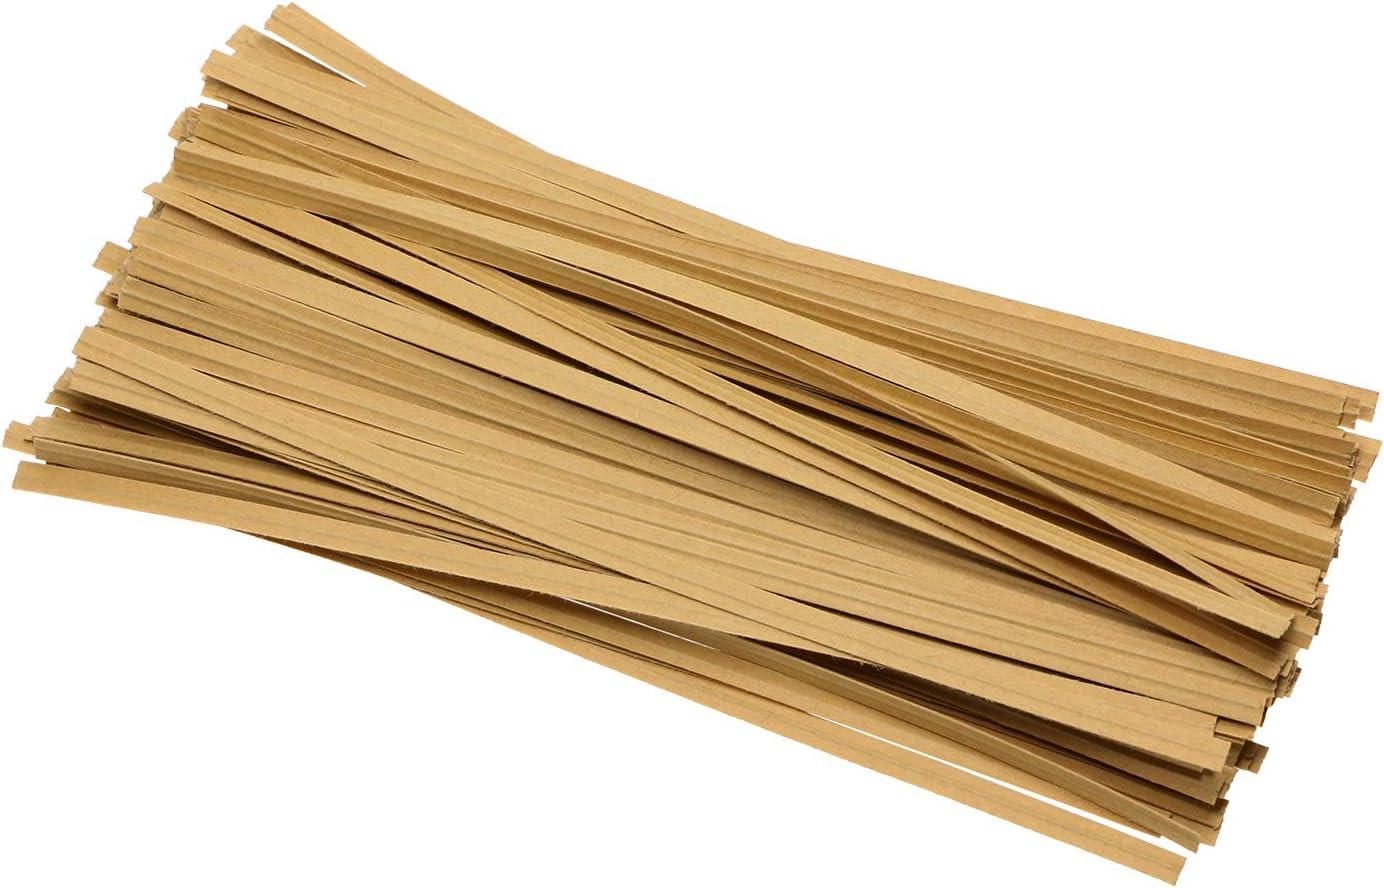 ONLYKXY 100 Pieces Kraft Paper Twist Ties, Paper Twist Ties, Bread Twist Ties, Candy Ties for Bags, 6 Inch (Kraft Paper)